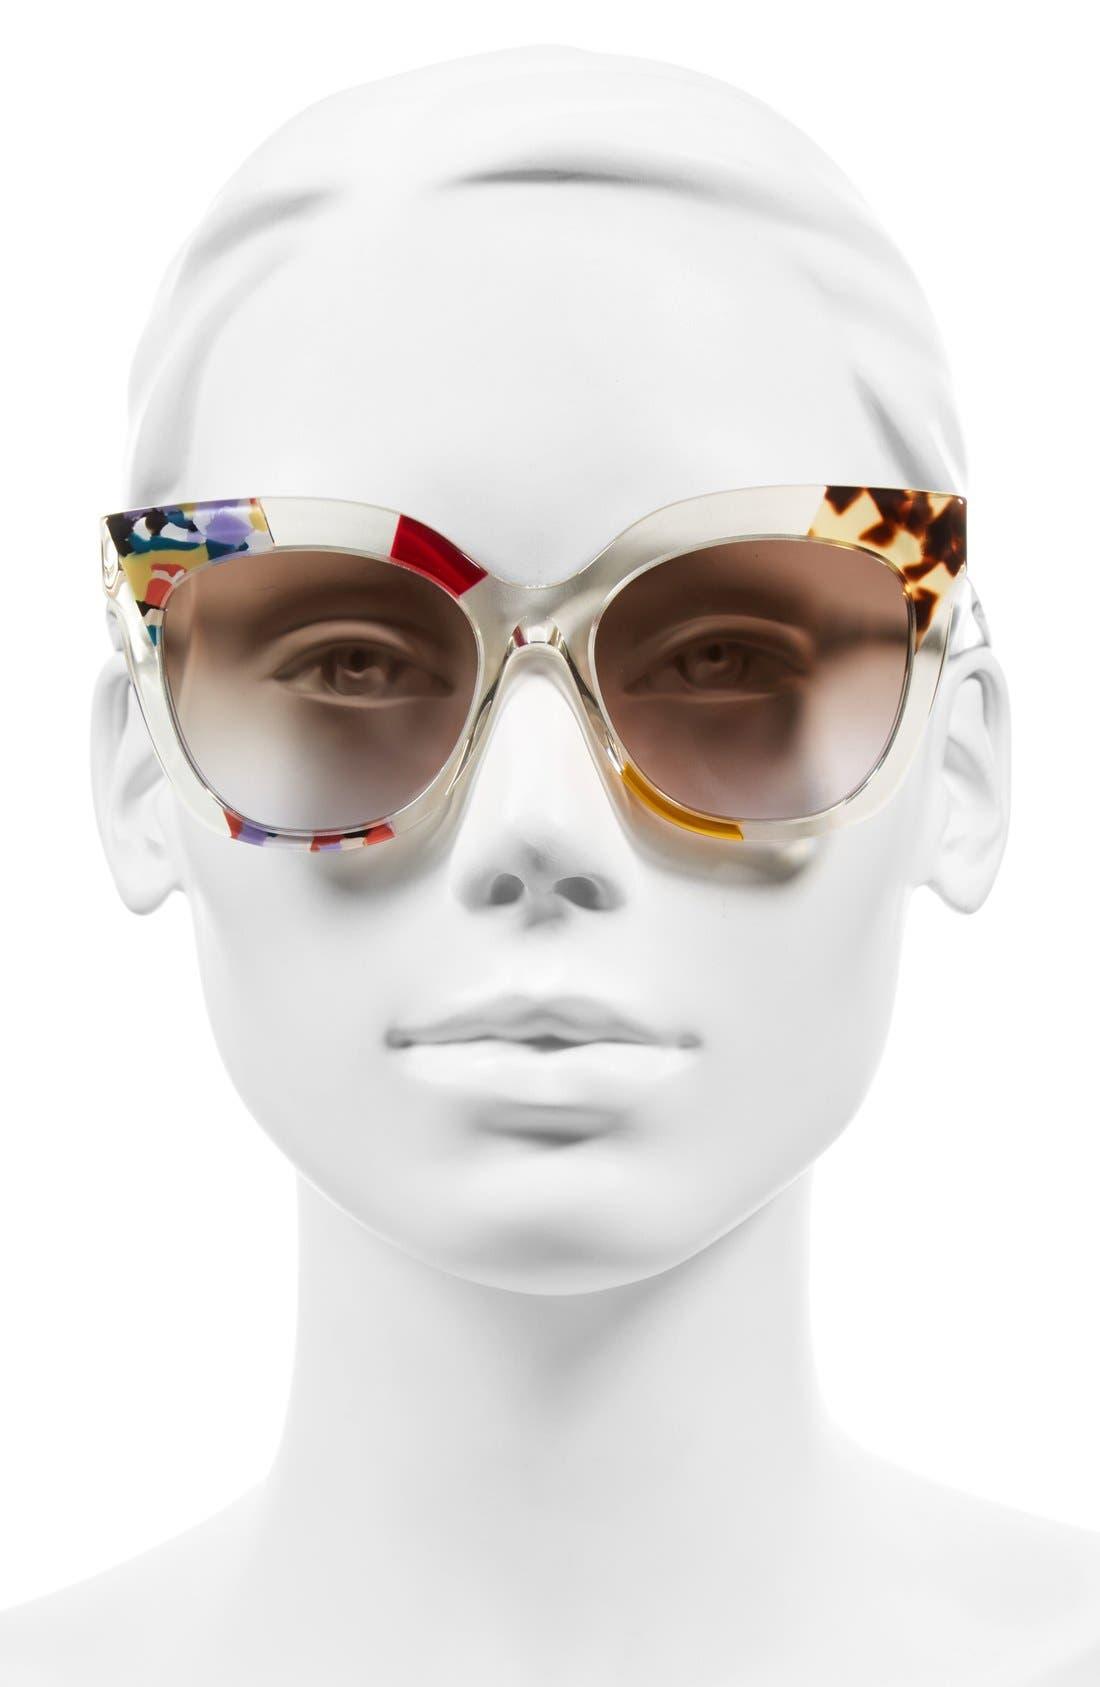 53mm Retro Sunglasses,                             Alternate thumbnail 2, color,                             Honey/ Crystal